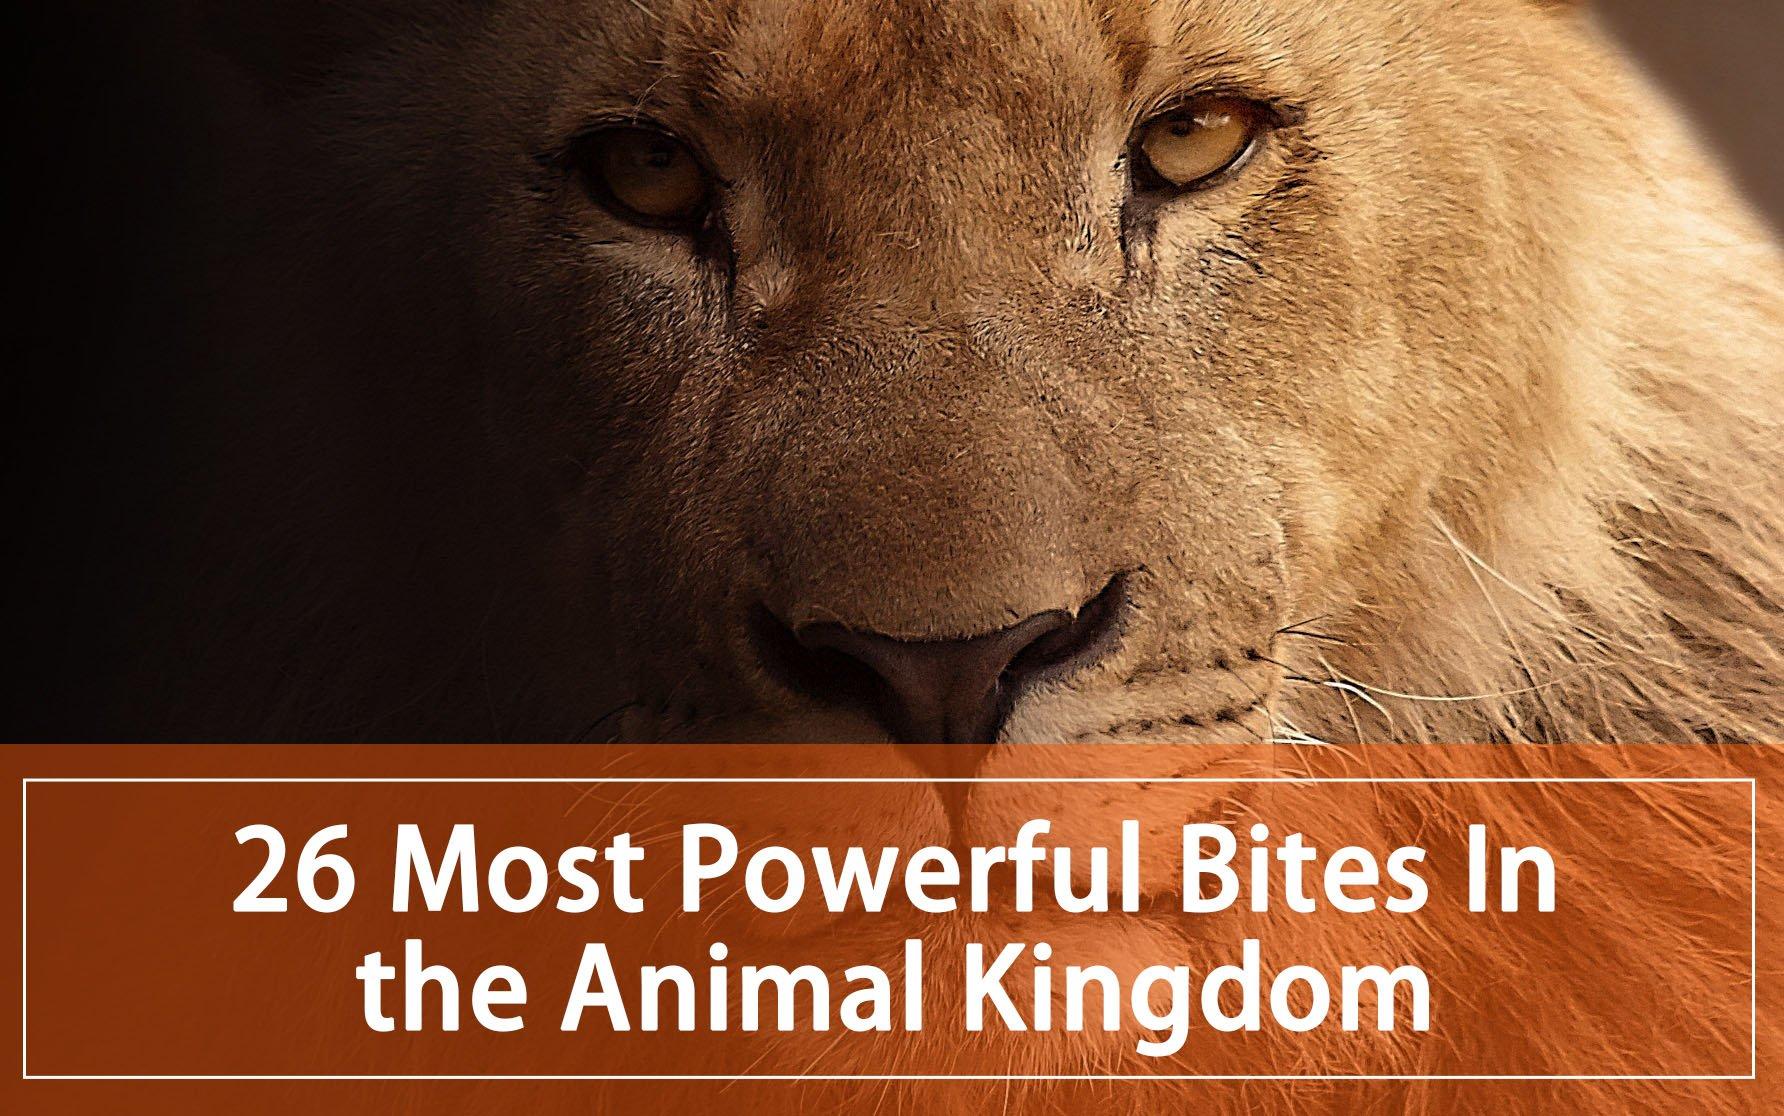 26 Most Powerful Bites in the Animal Kingdom (2019) - Pest Wiki